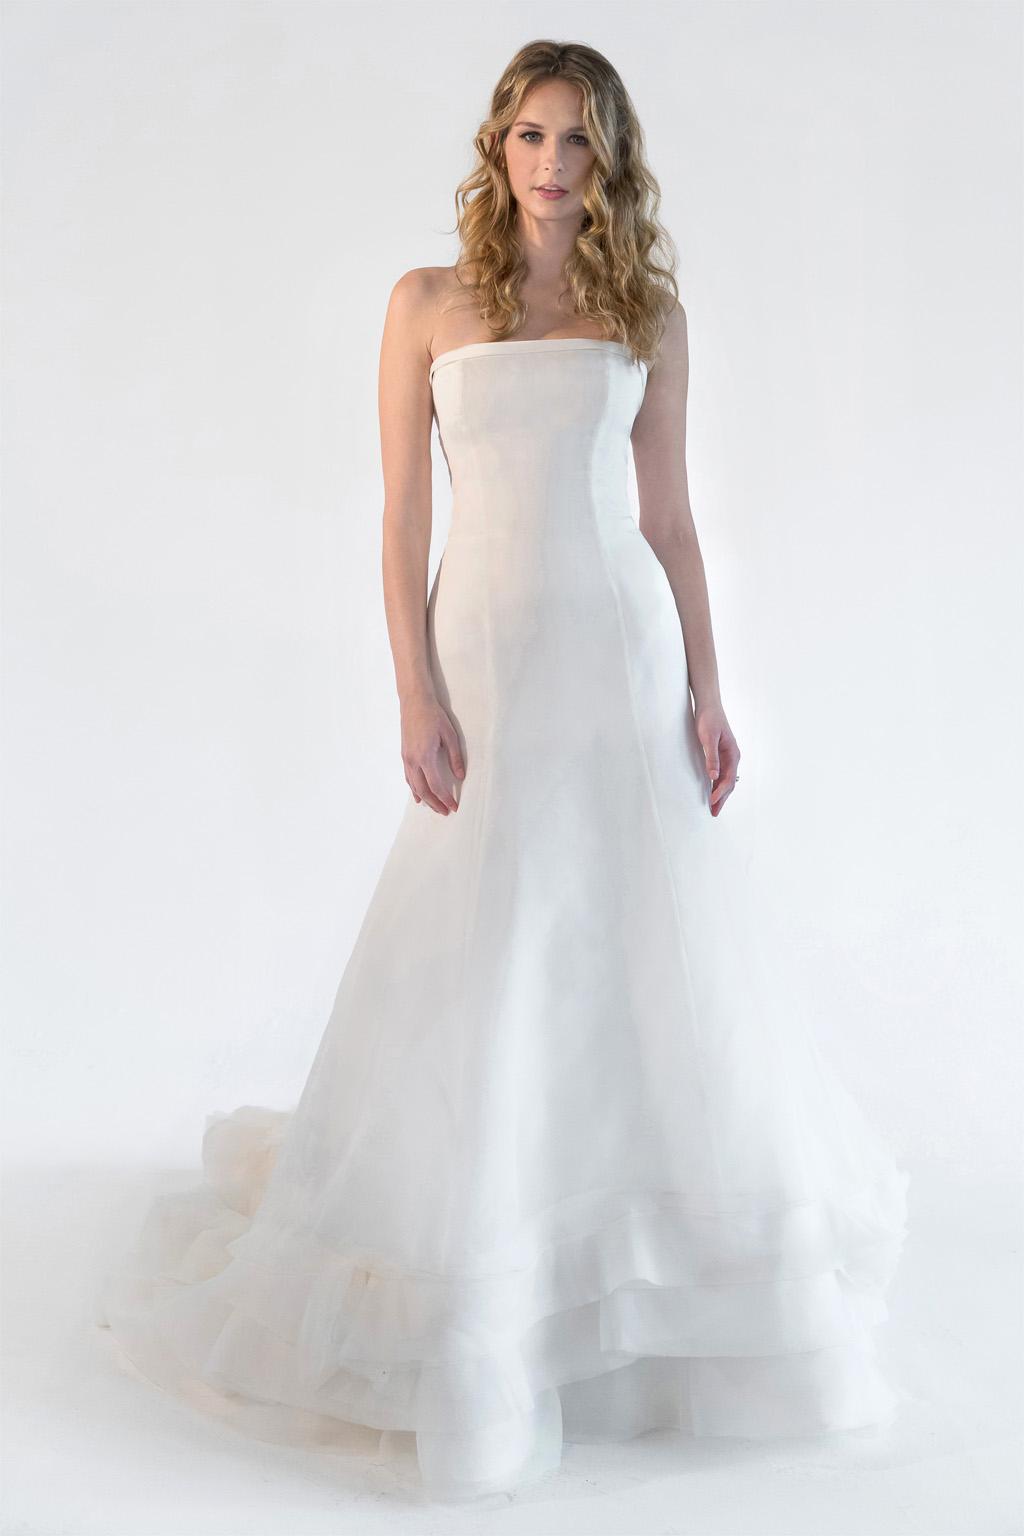 Stunning Jenny Lee Wedding Dresses Gallery - Wedding Dress Ideas ...